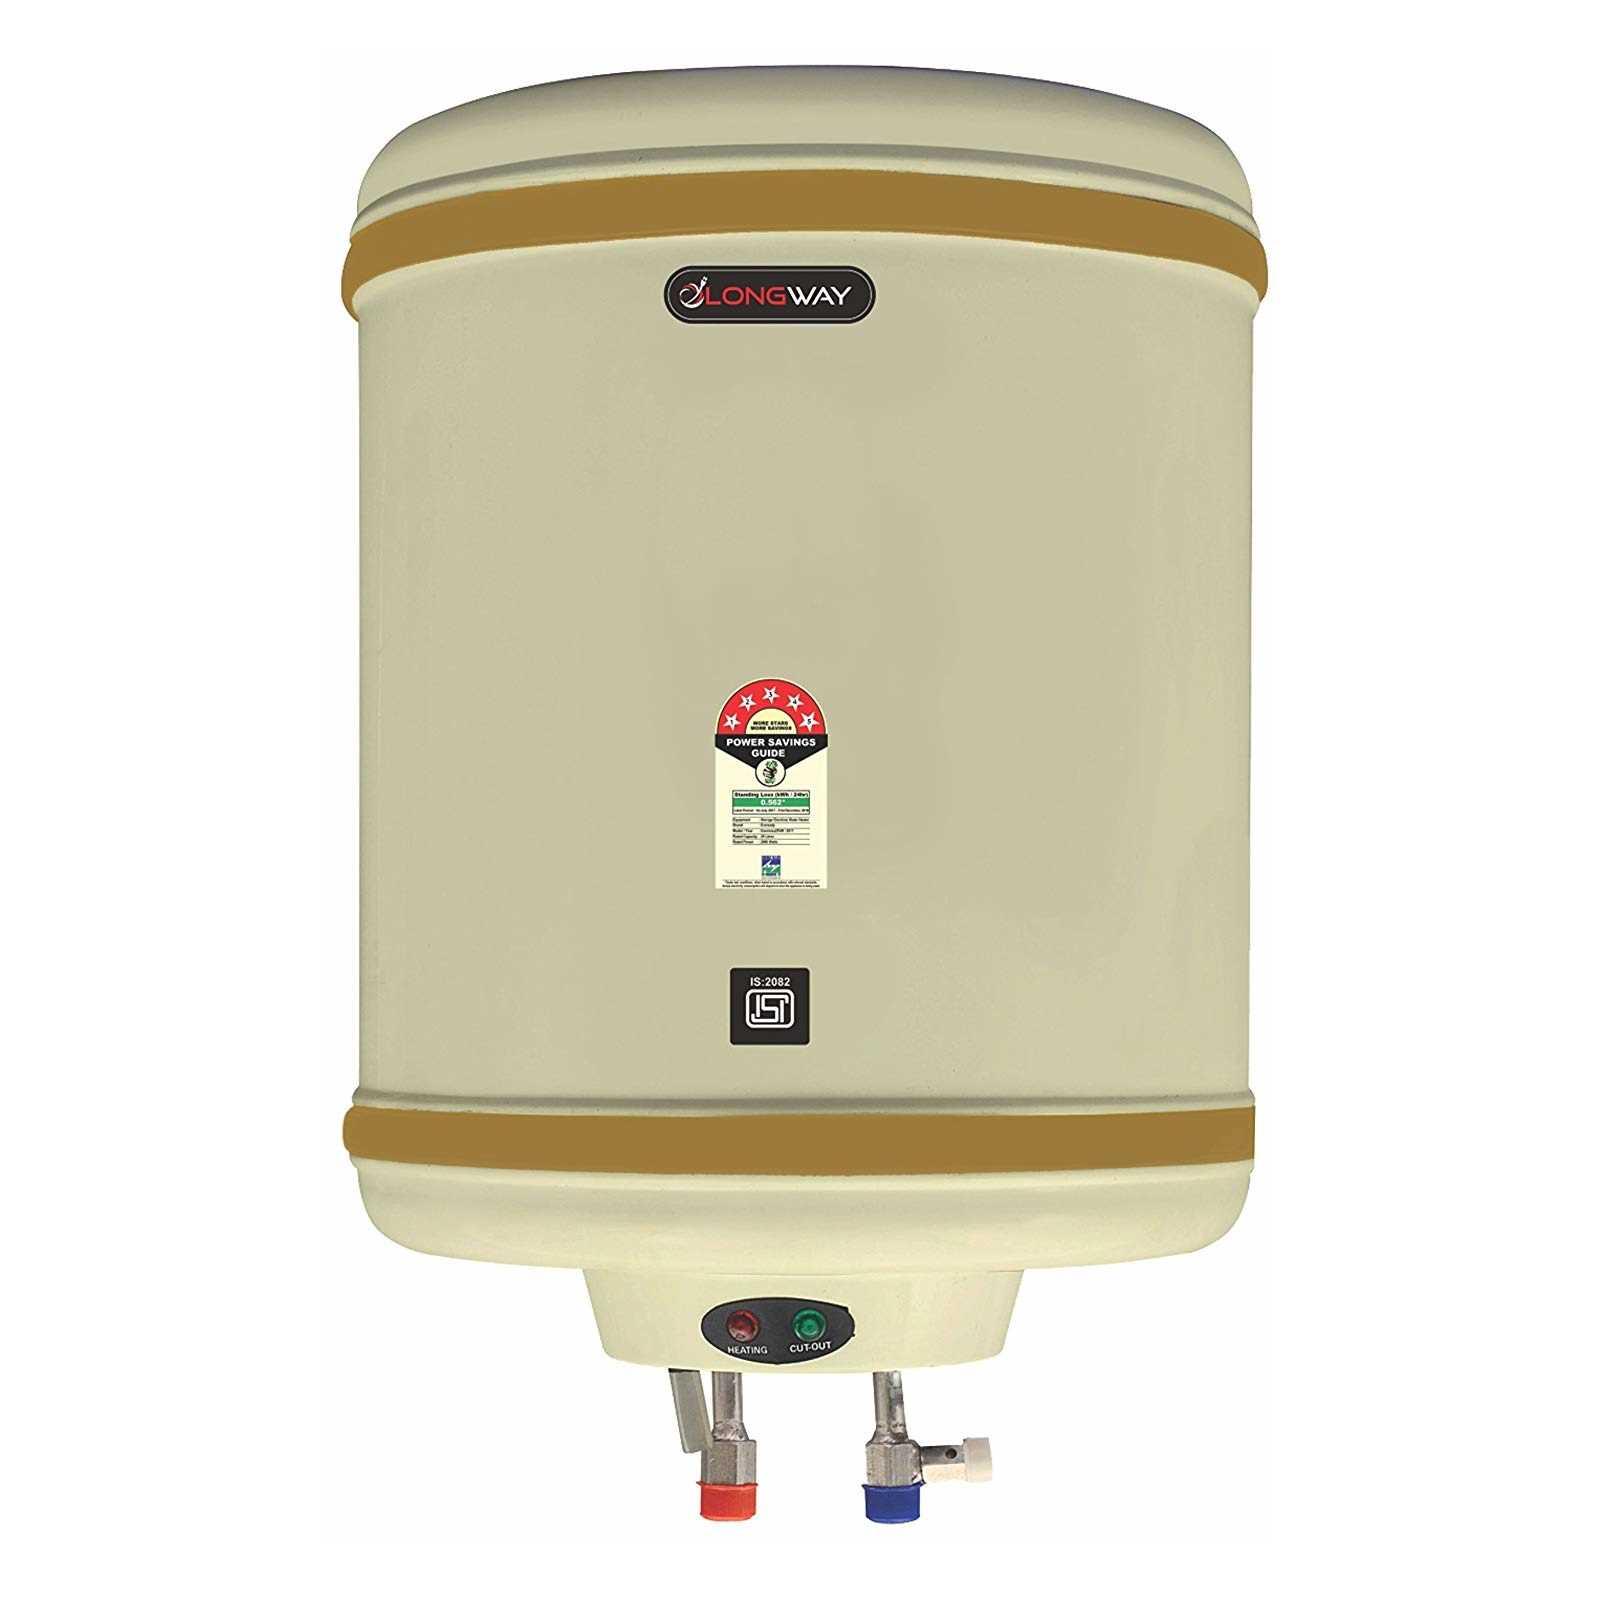 Longway Hotstar 35 Litre Storage Water Heater